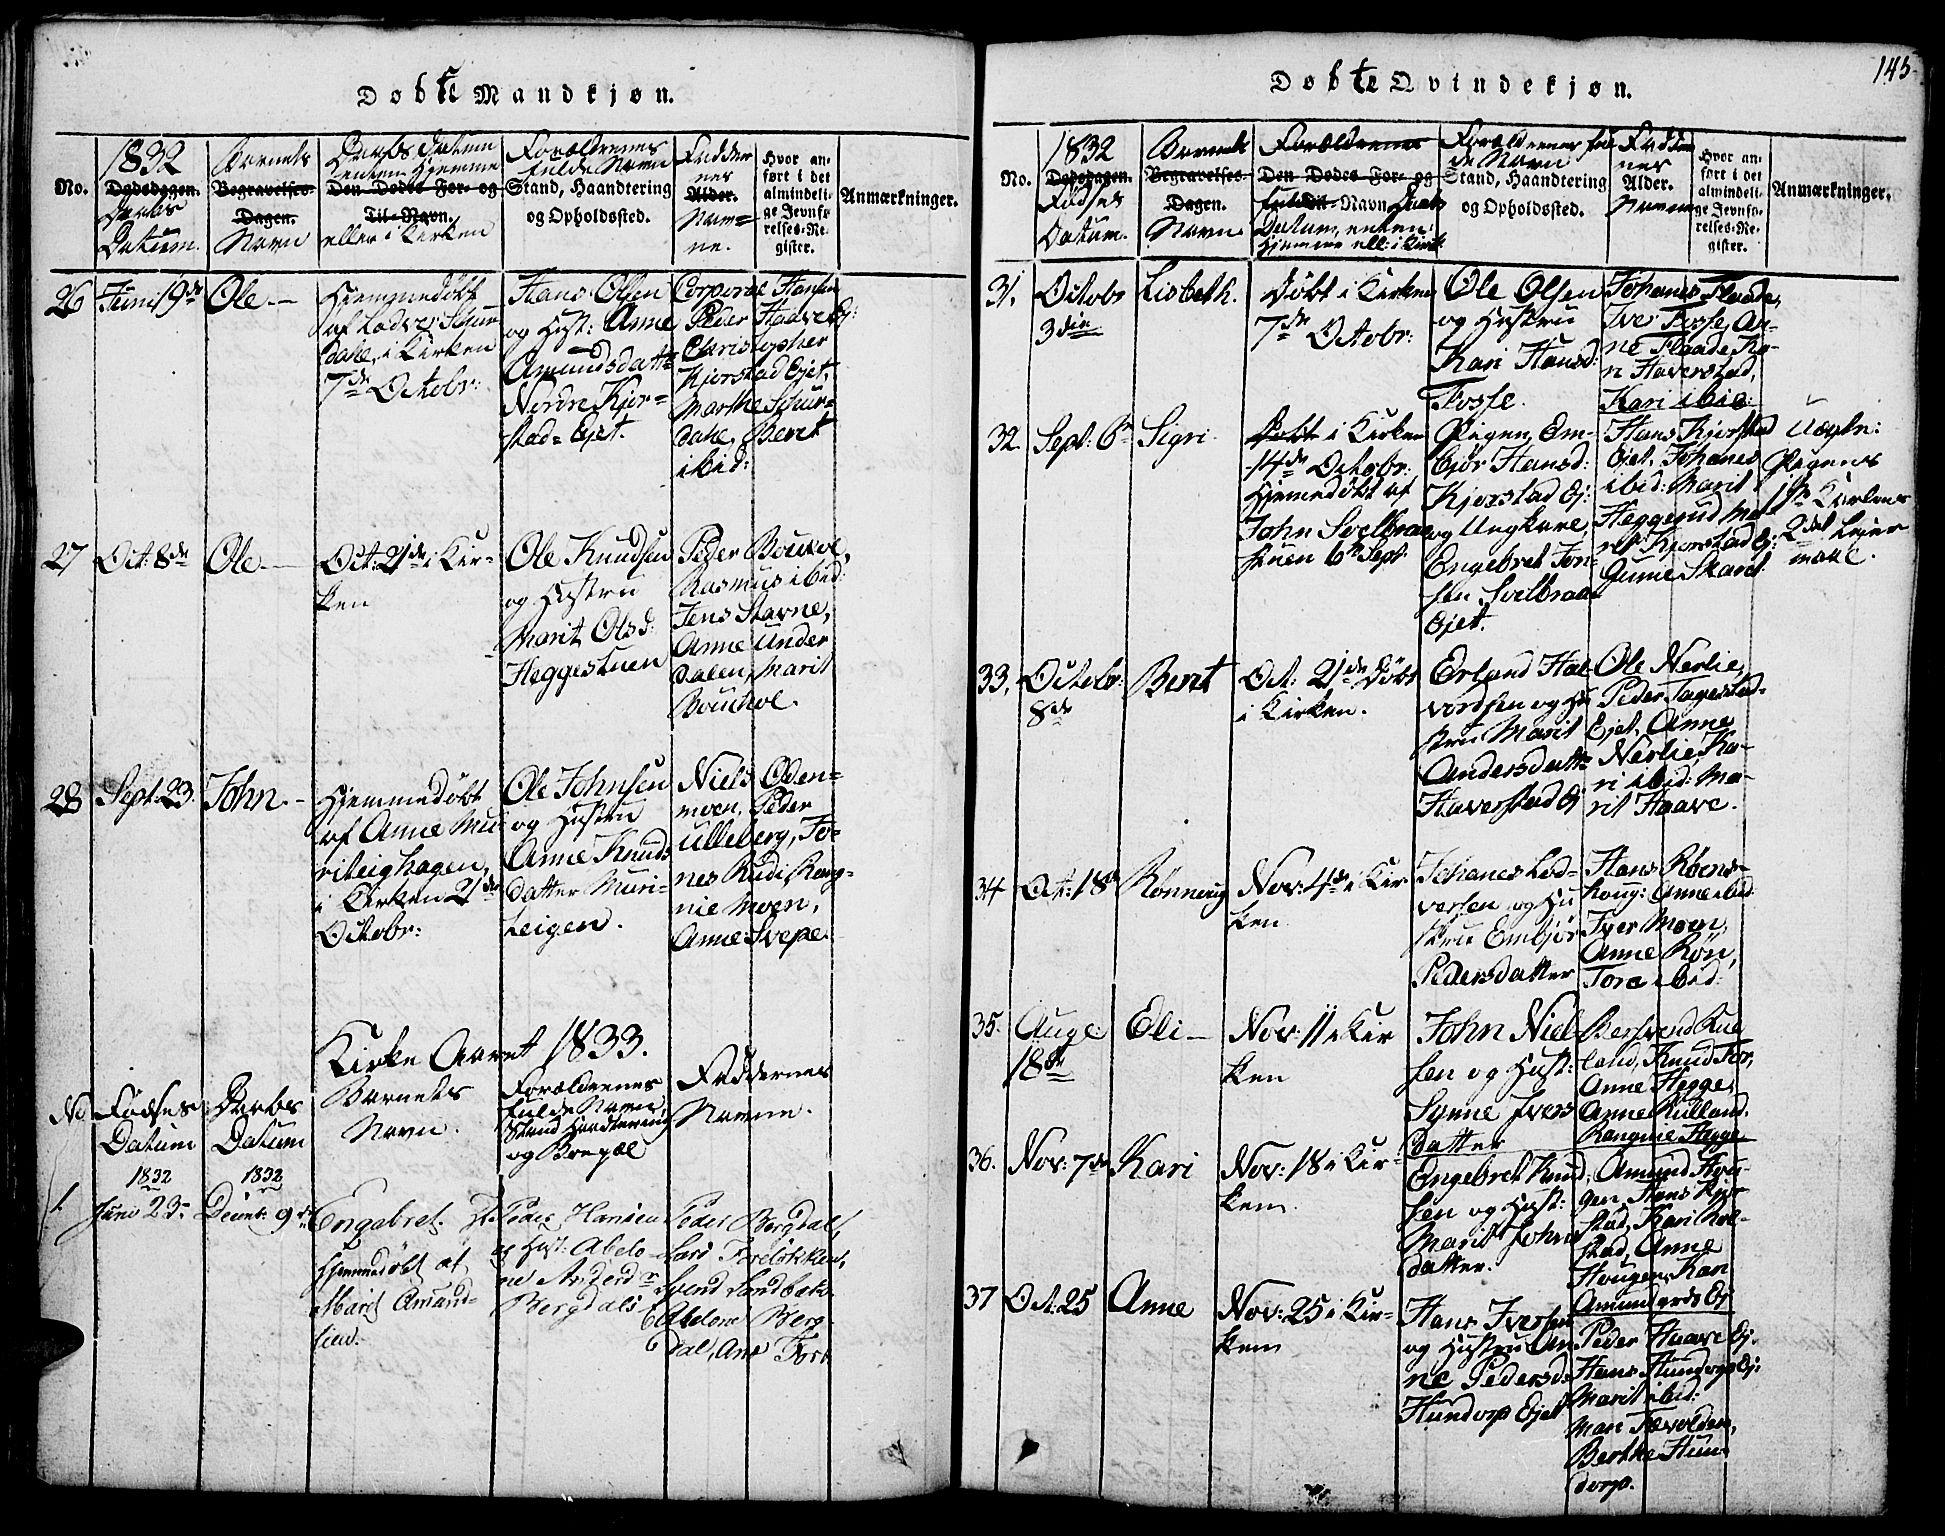 SAH, Fron prestekontor, H/Ha/Hab/L0001: Klokkerbok nr. 1, 1816-1843, s. 145